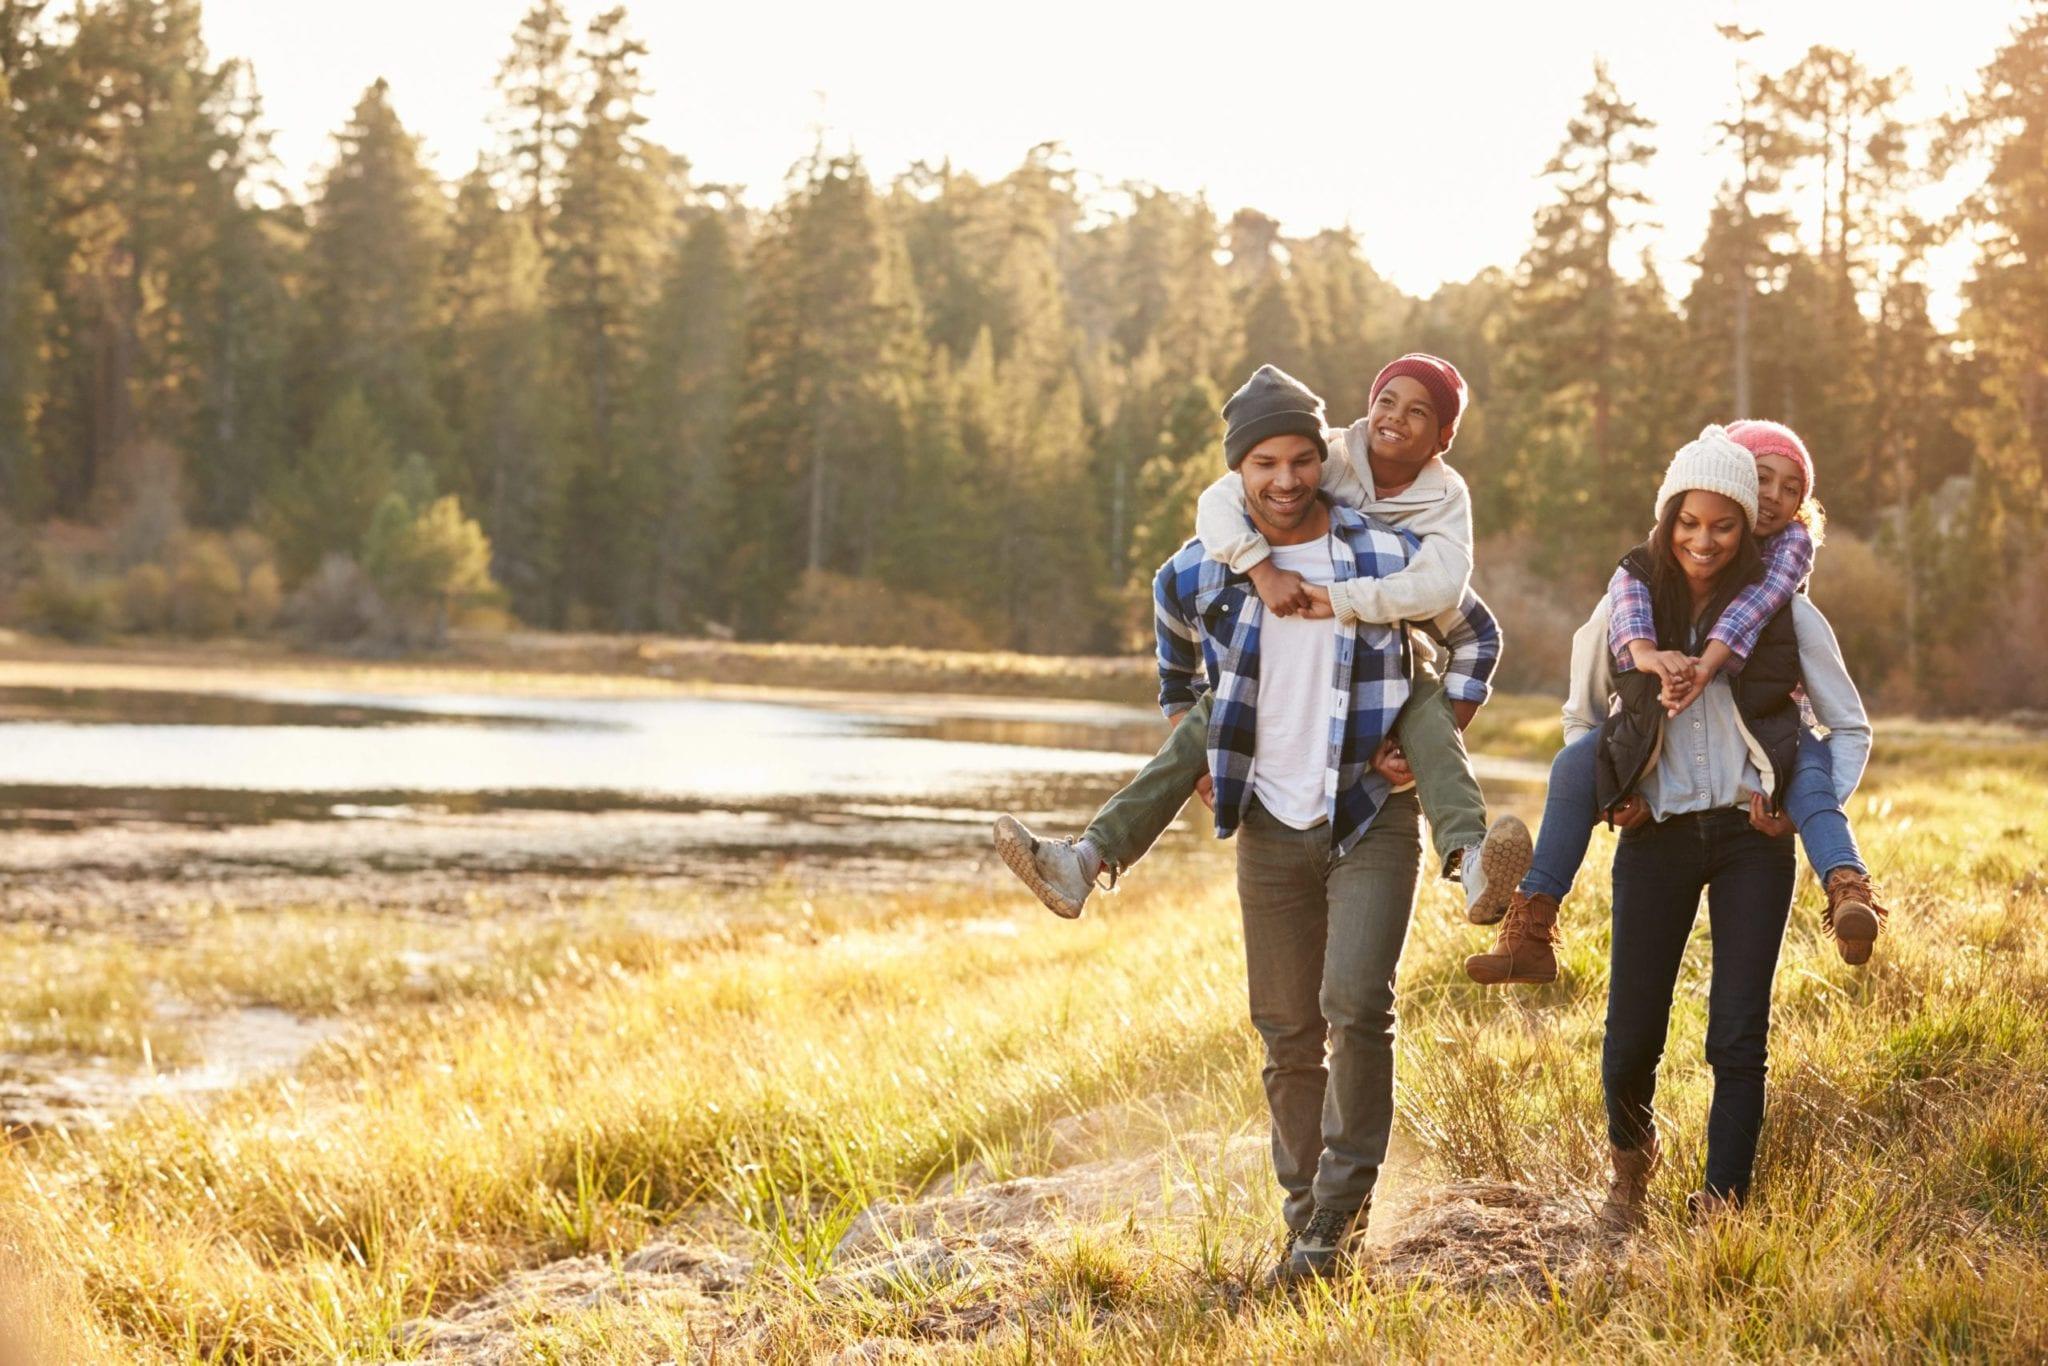 What Is Destroying Family Bonding?